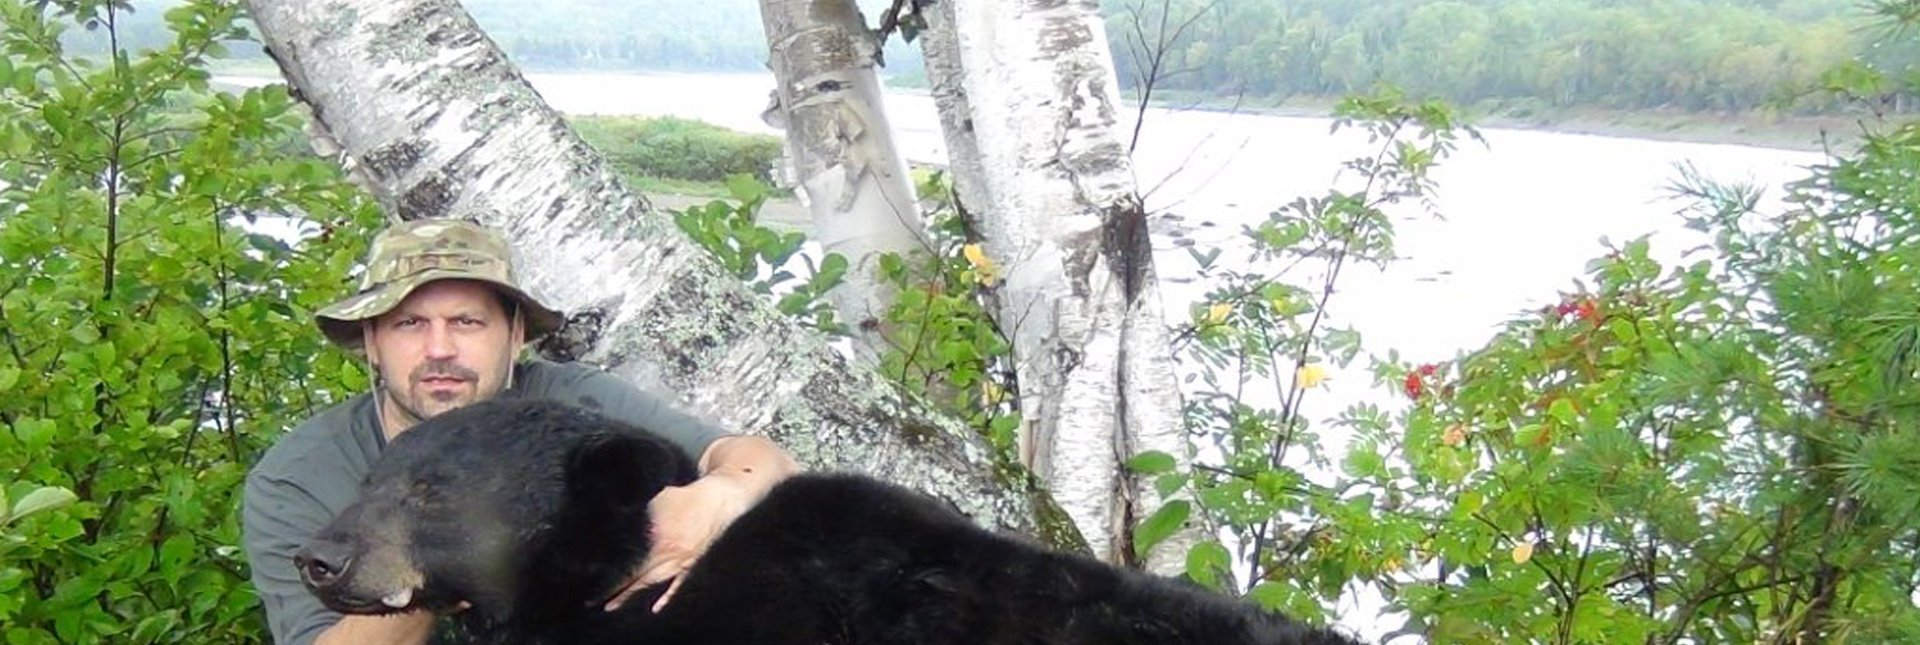 bear-banner